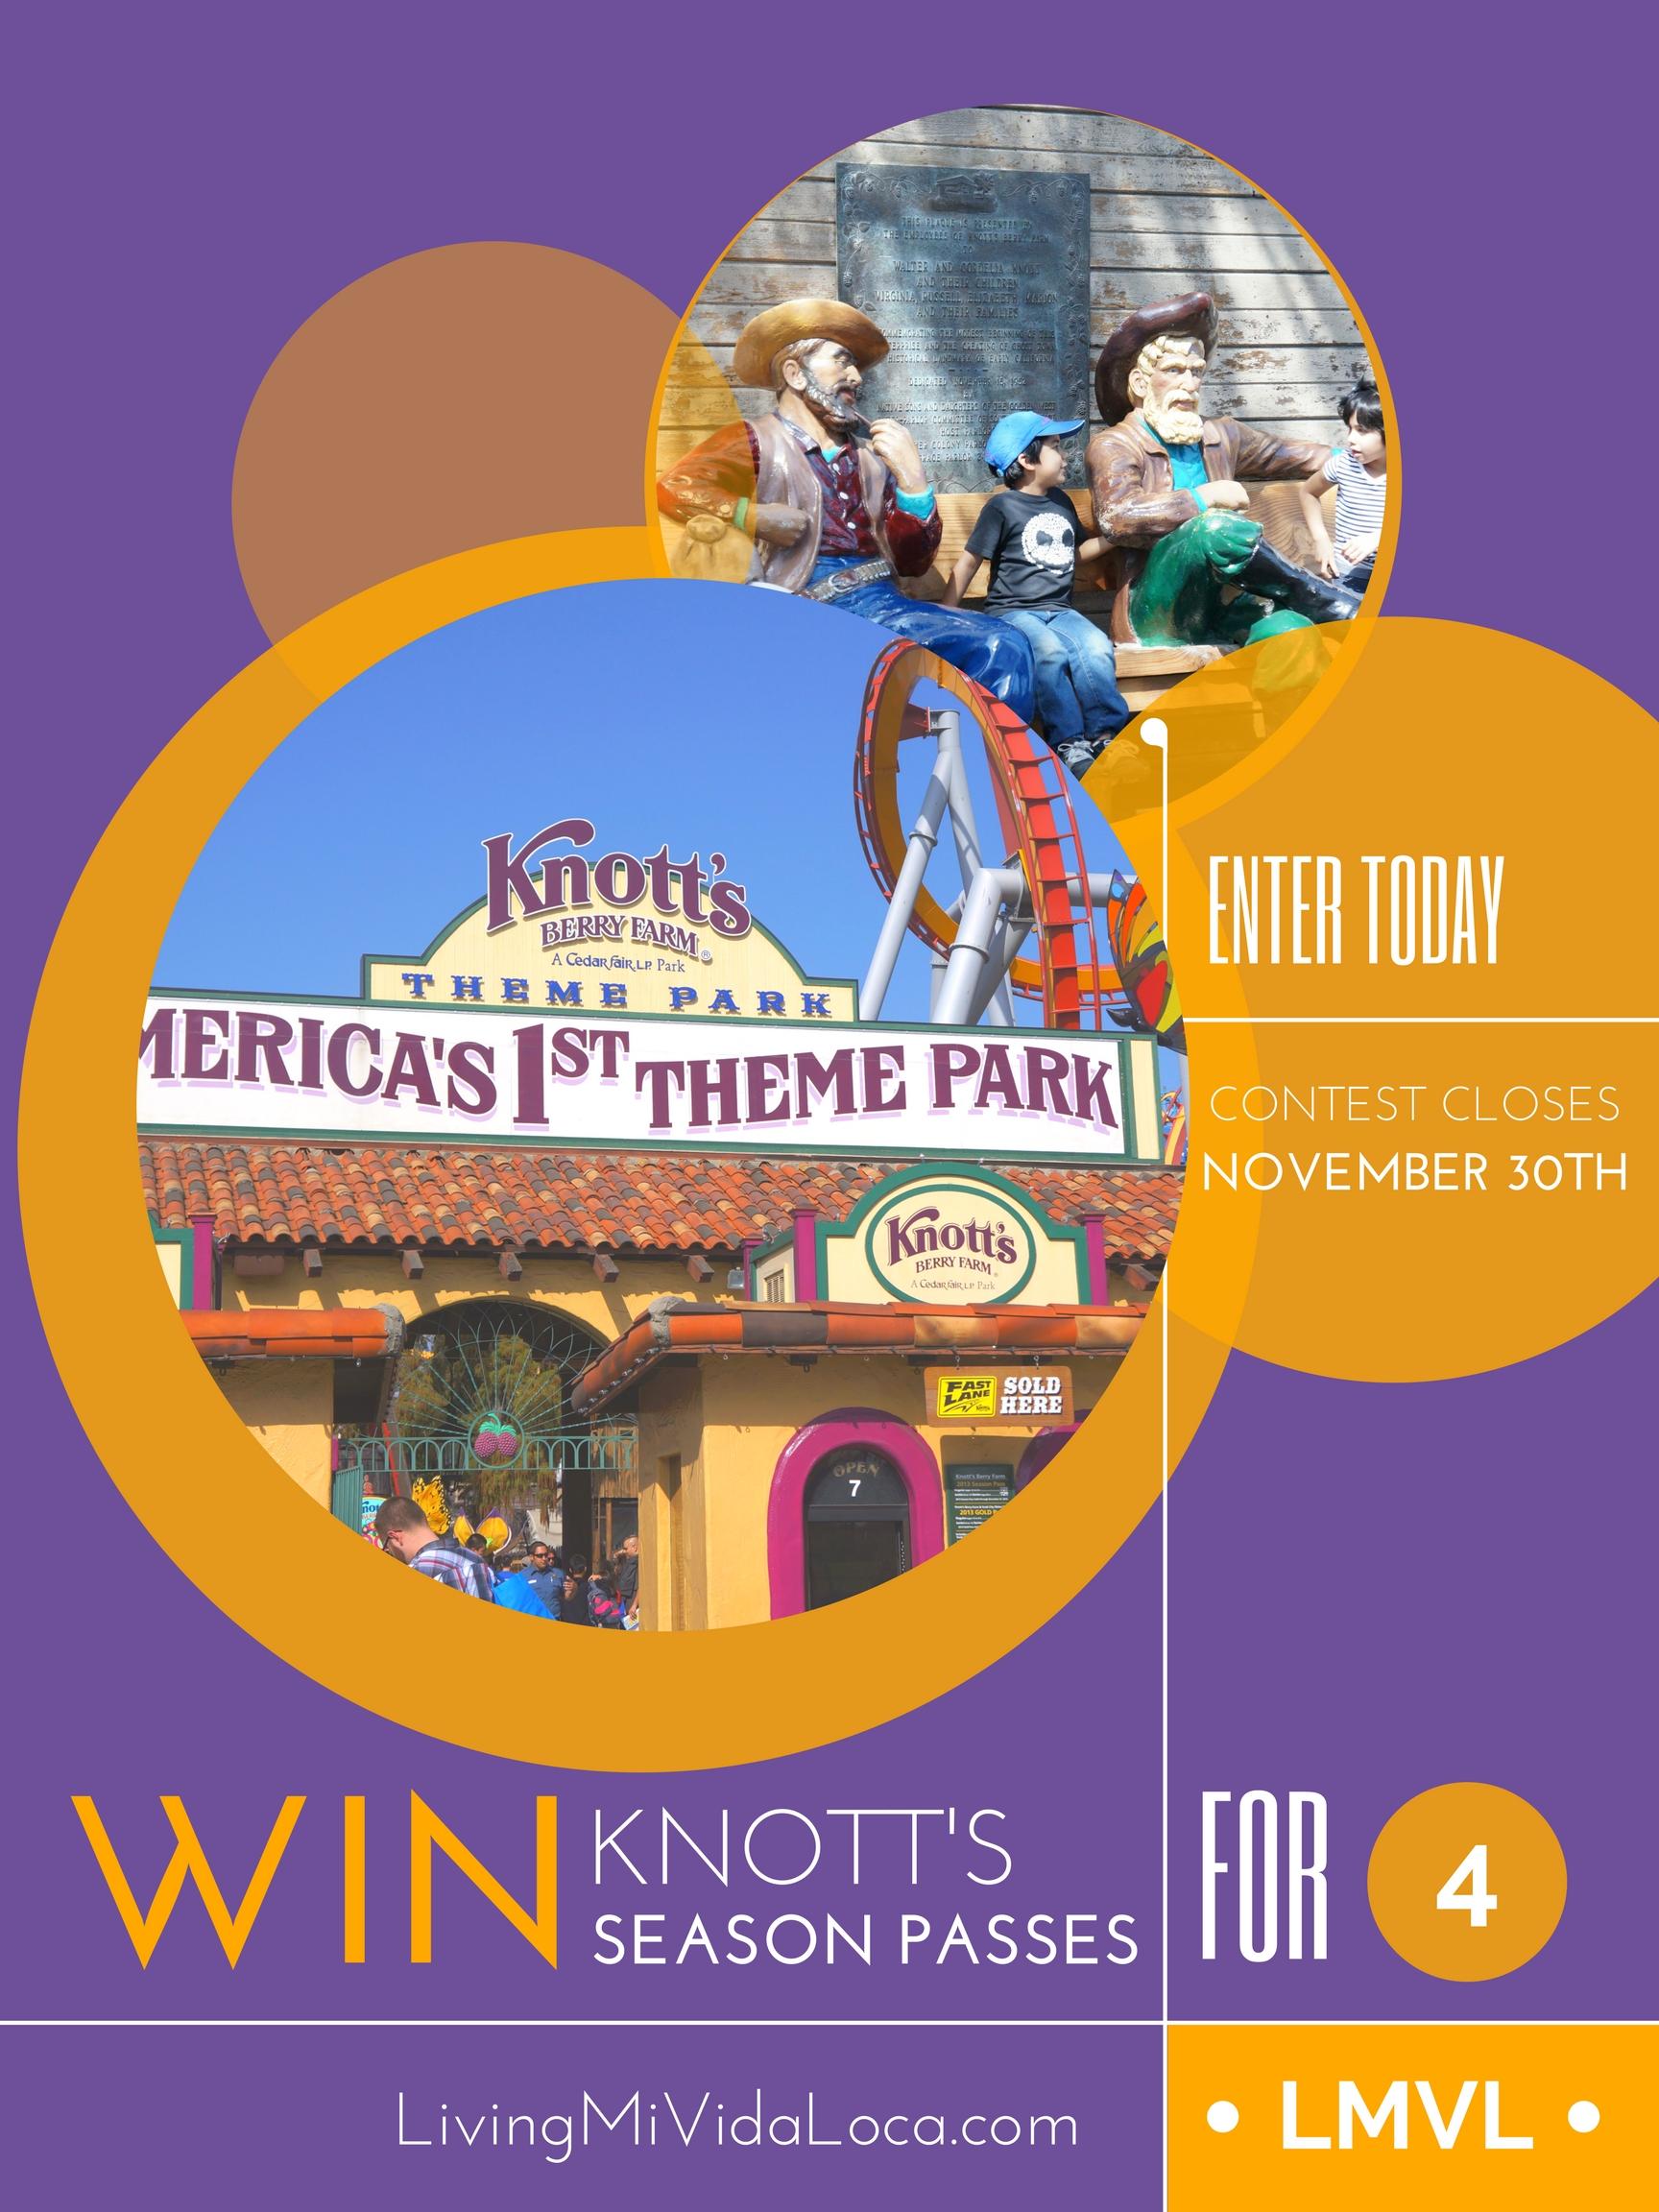 knott's season pass giveaway - livingmividaloca.com